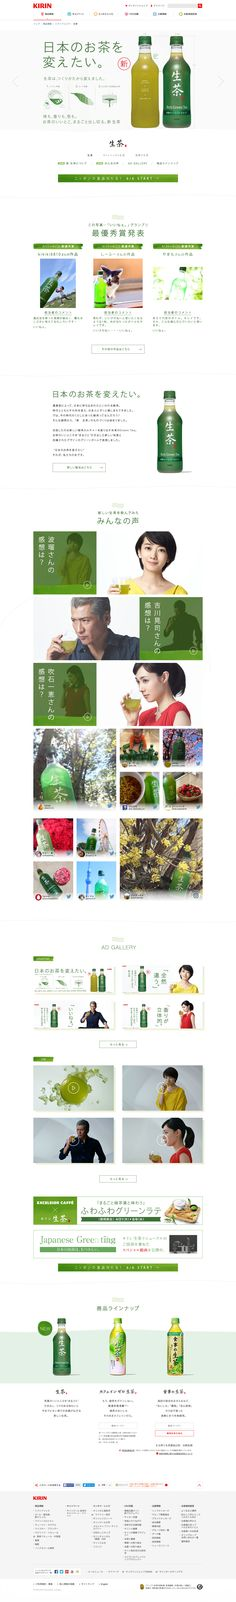 生茶 - KIRIN Best Web Design, Page Design, Otaku Anime, Web Layout, Layout Design, Japan Branding, Packaging Design, Branding Design, Tea Website